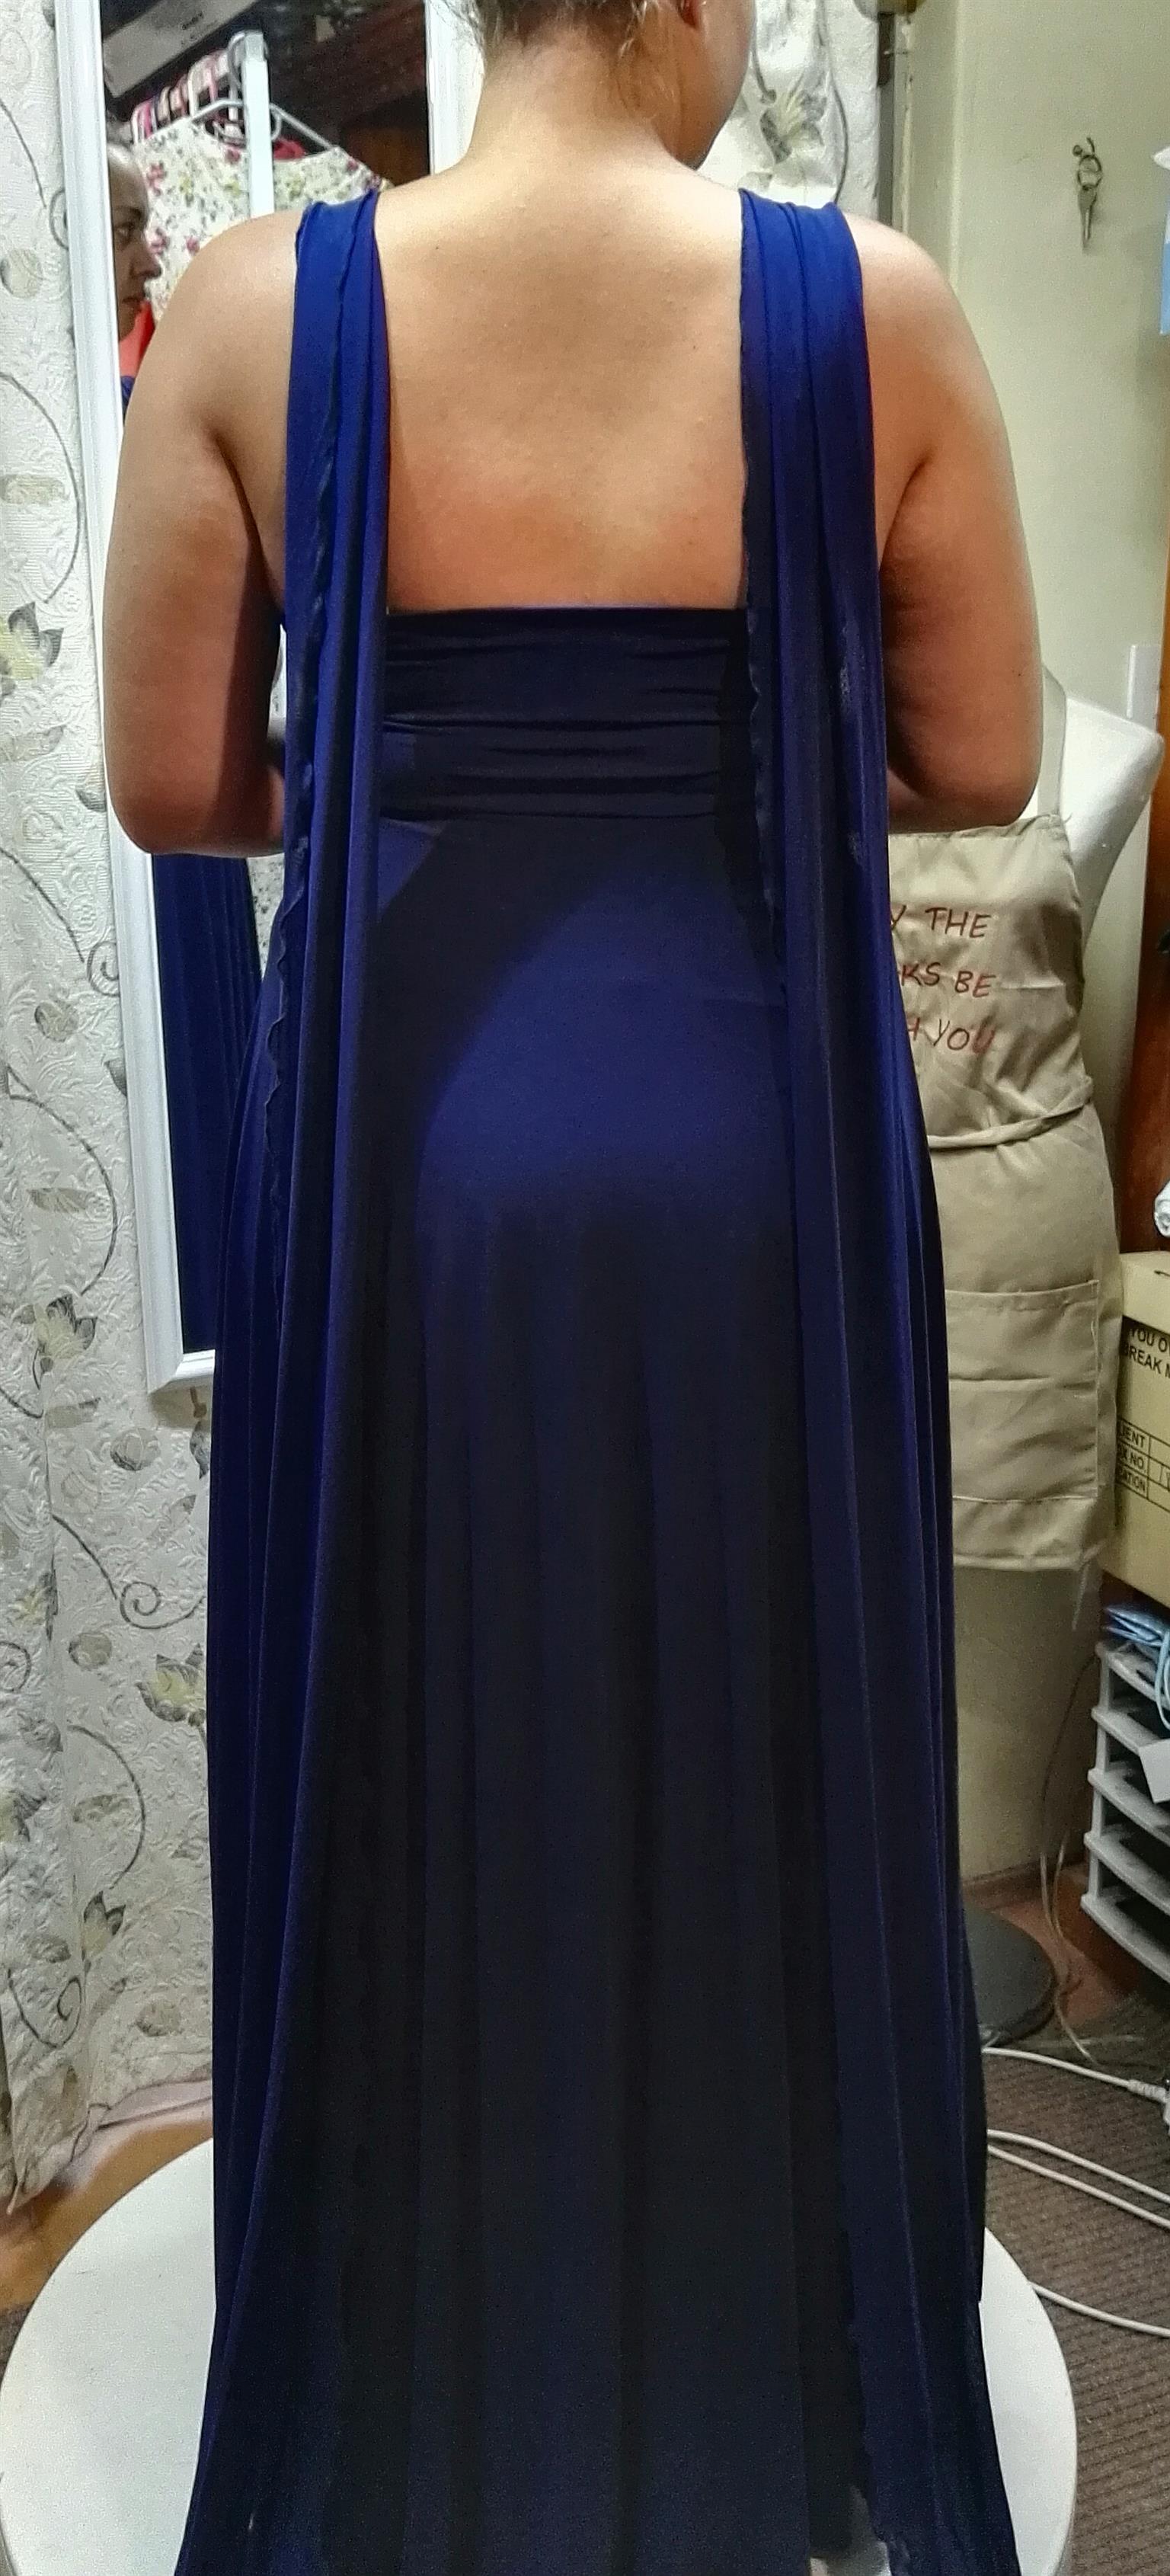 Neverending Tie Dresses Original, A-Line and Pencil Skirt design for Bridesmaids and Special Occasions